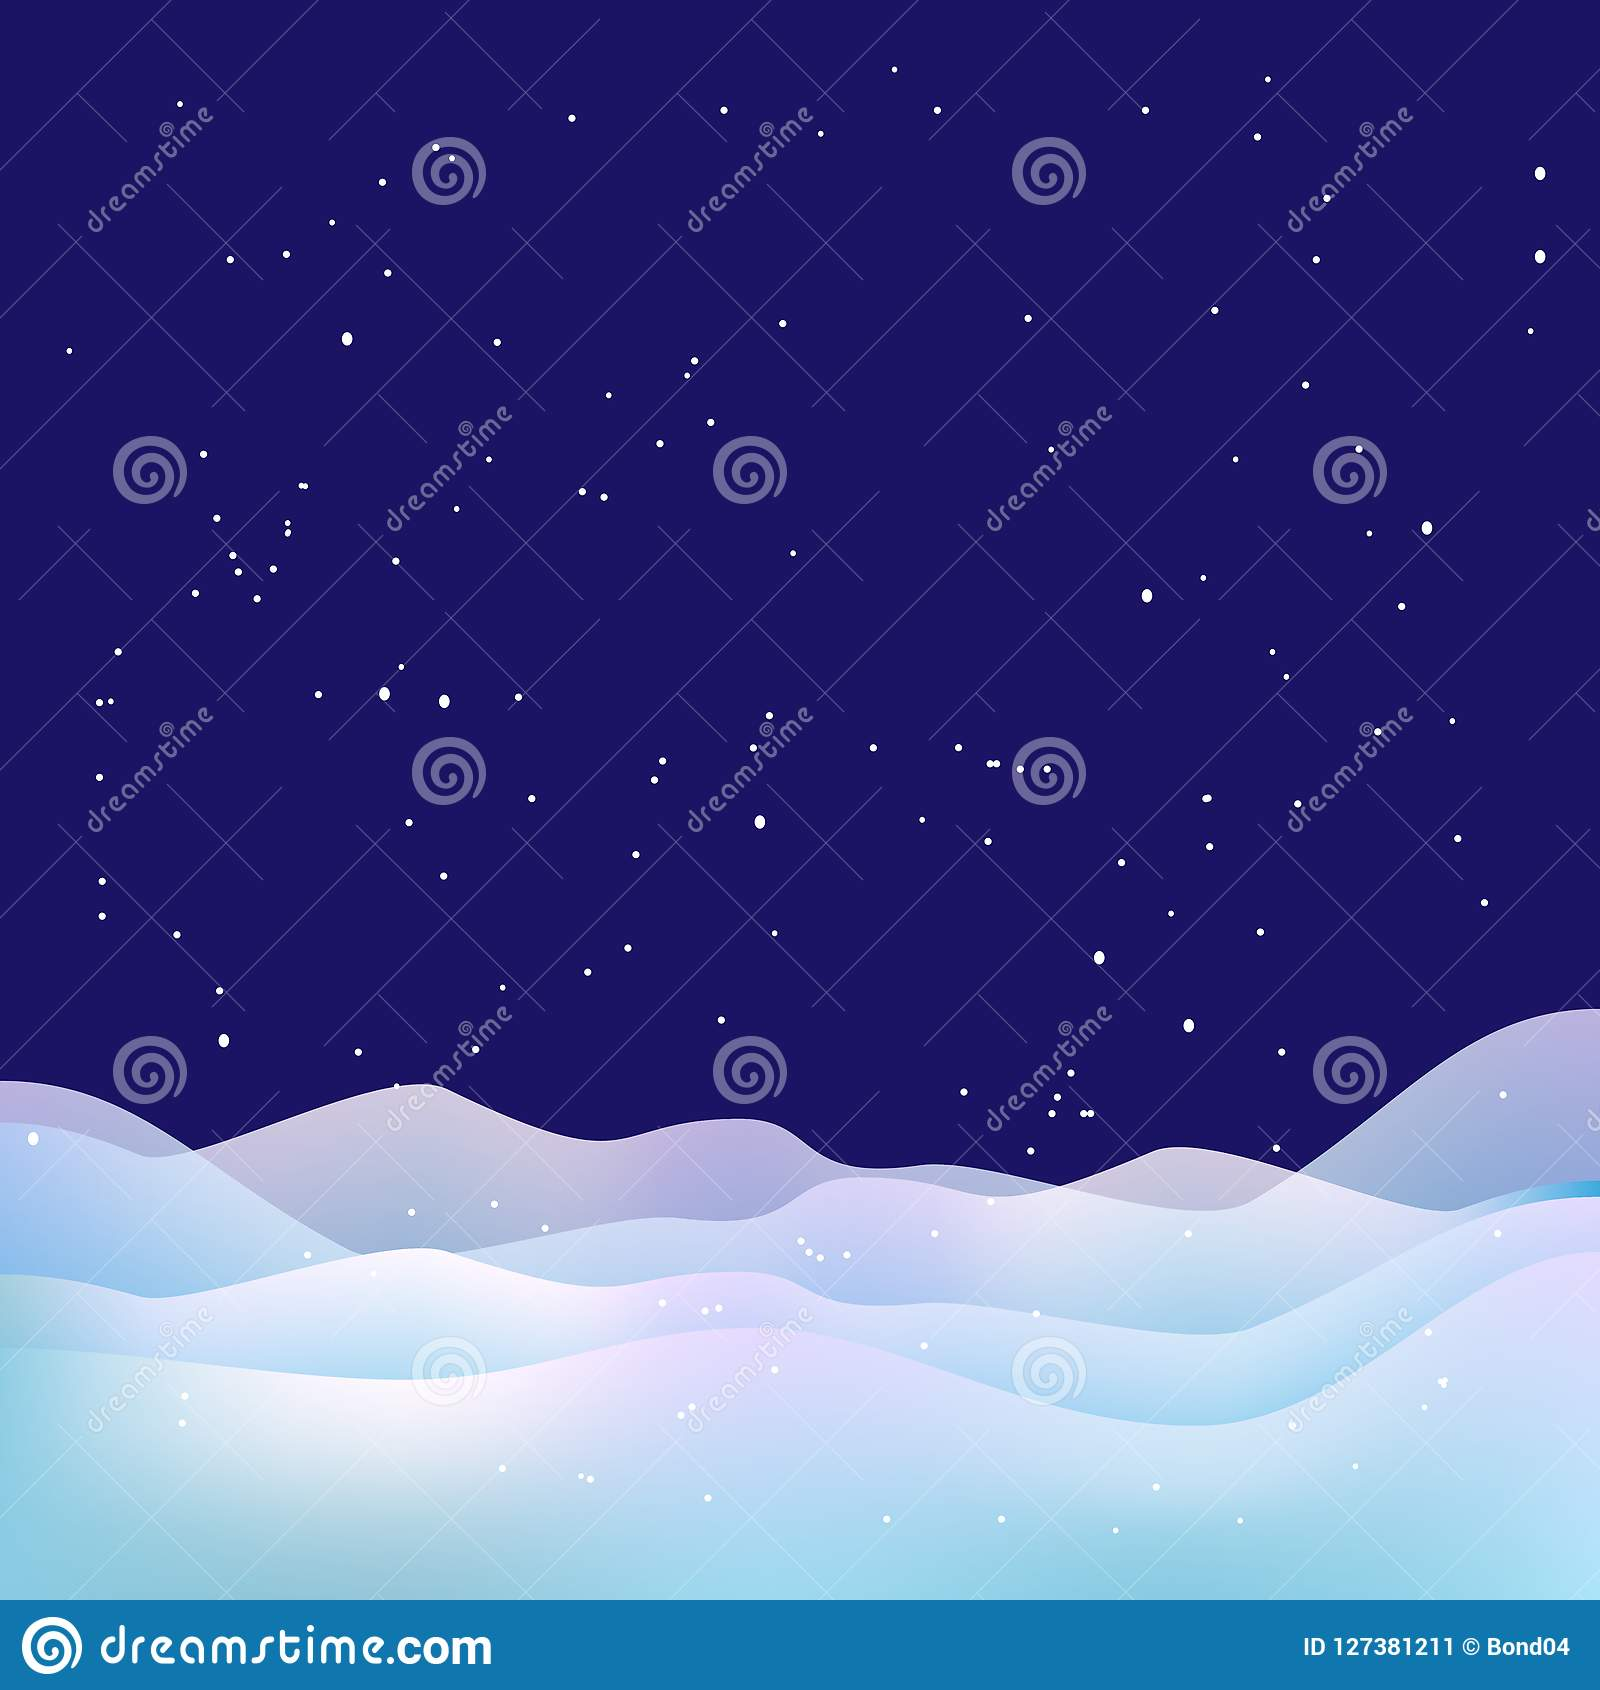 Xmas night background. Snow, stars and snowdrifts